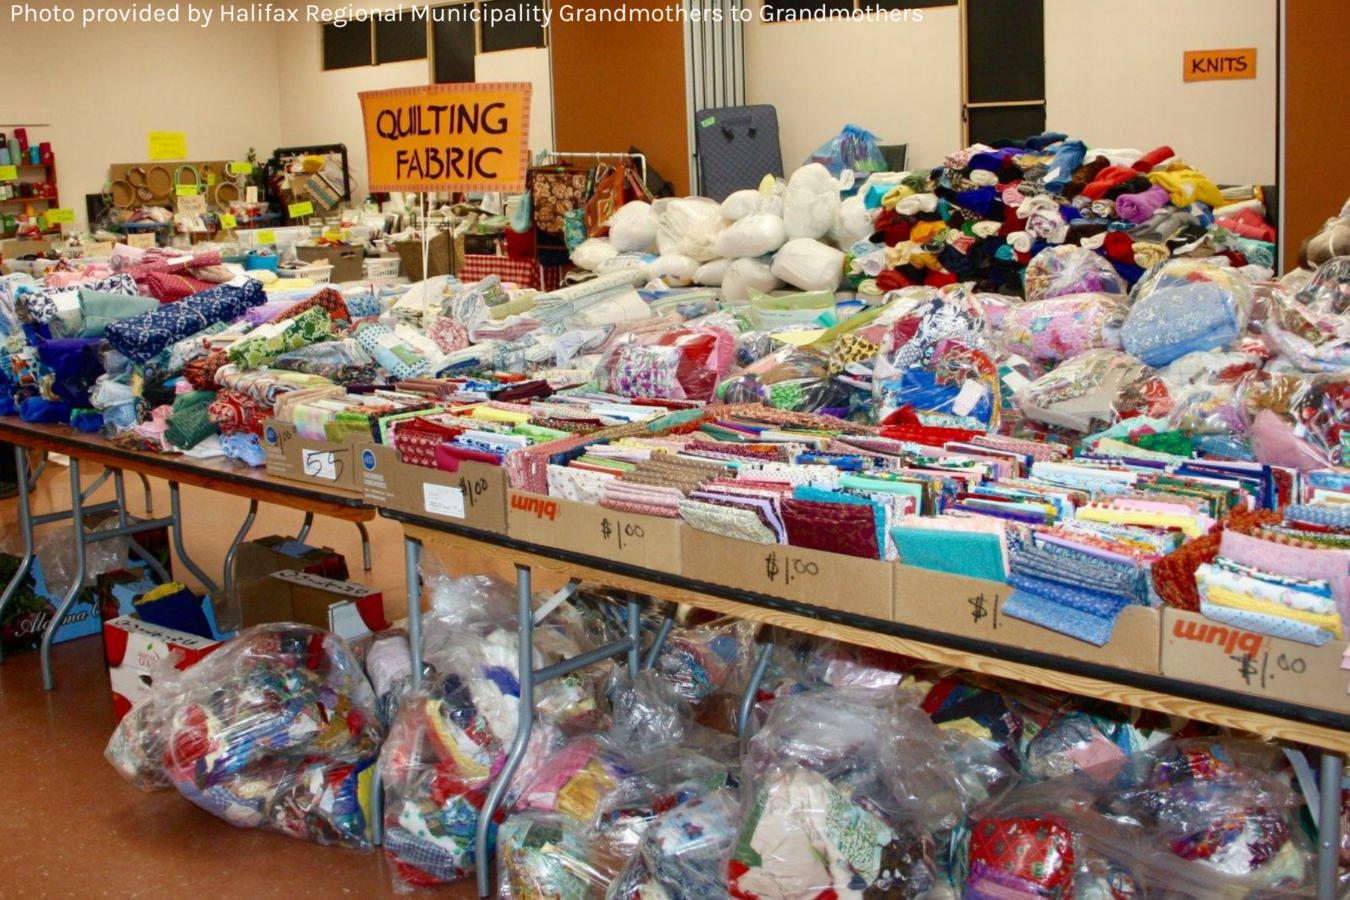 Halifax Regional Grandmothers' Fabric Sale